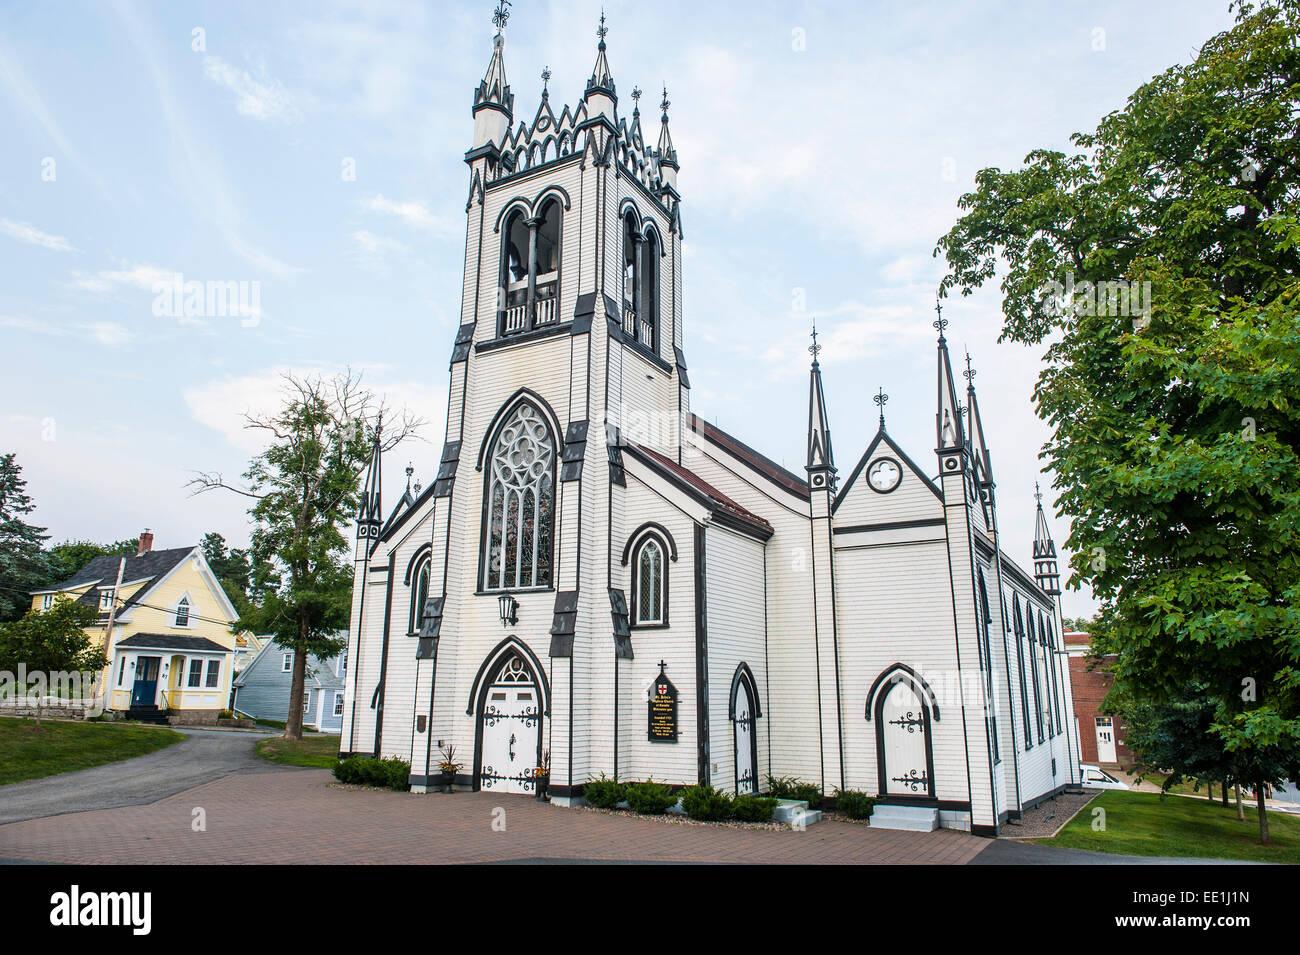 St. John's Anglican church in the old Town Lunenburg, UNESCO World Heritage Site, Nova Scotia, Canada, North - Stock Image